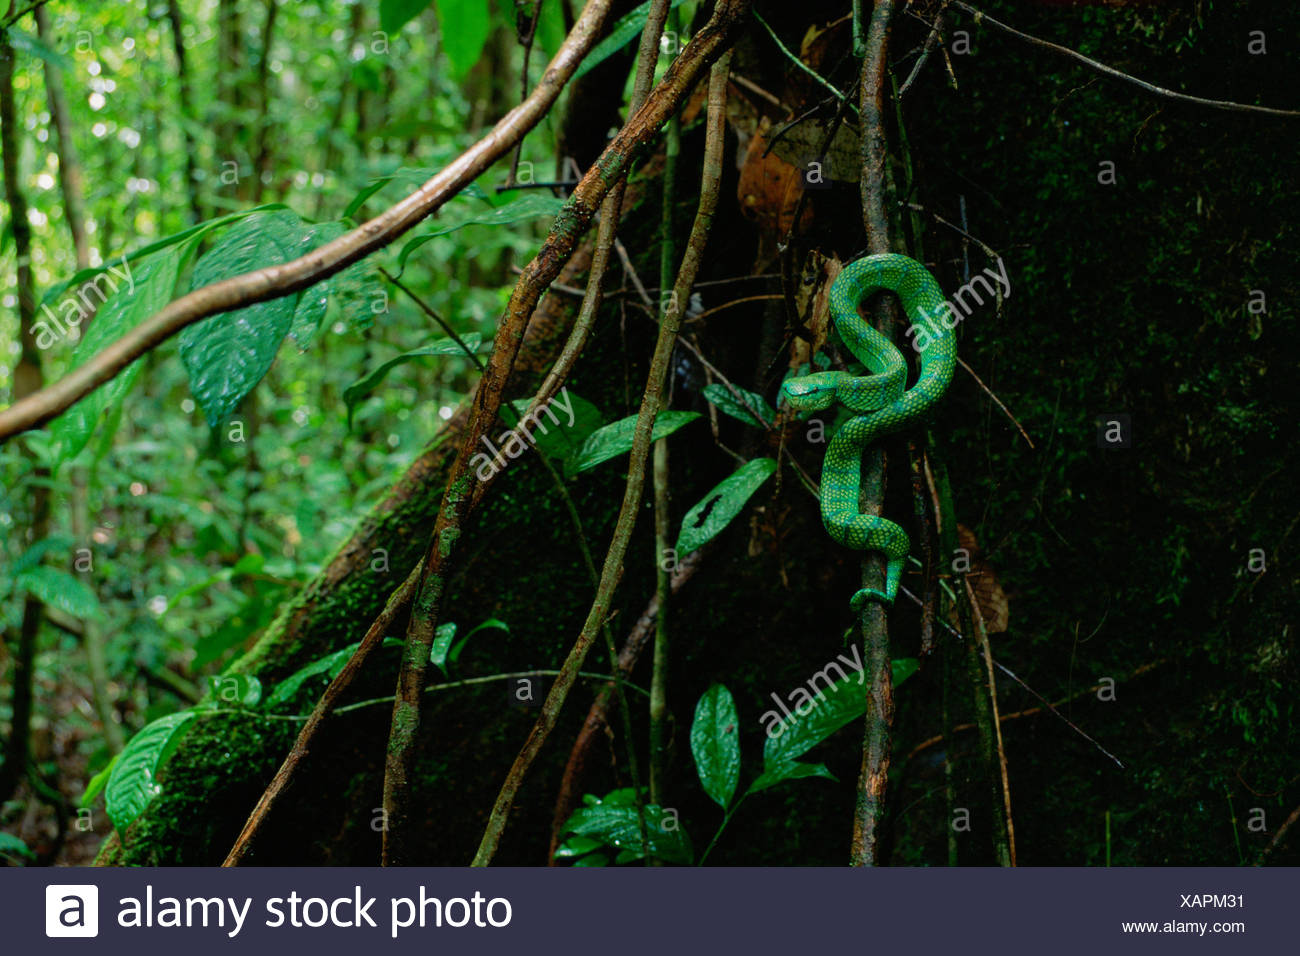 Wagler's / Temple pit viper (Tropidolaemus wagleri) in lowland rainforest, Gunung Palung National Park, Borneo, West Kalimantan, Indonesia - Stock Image